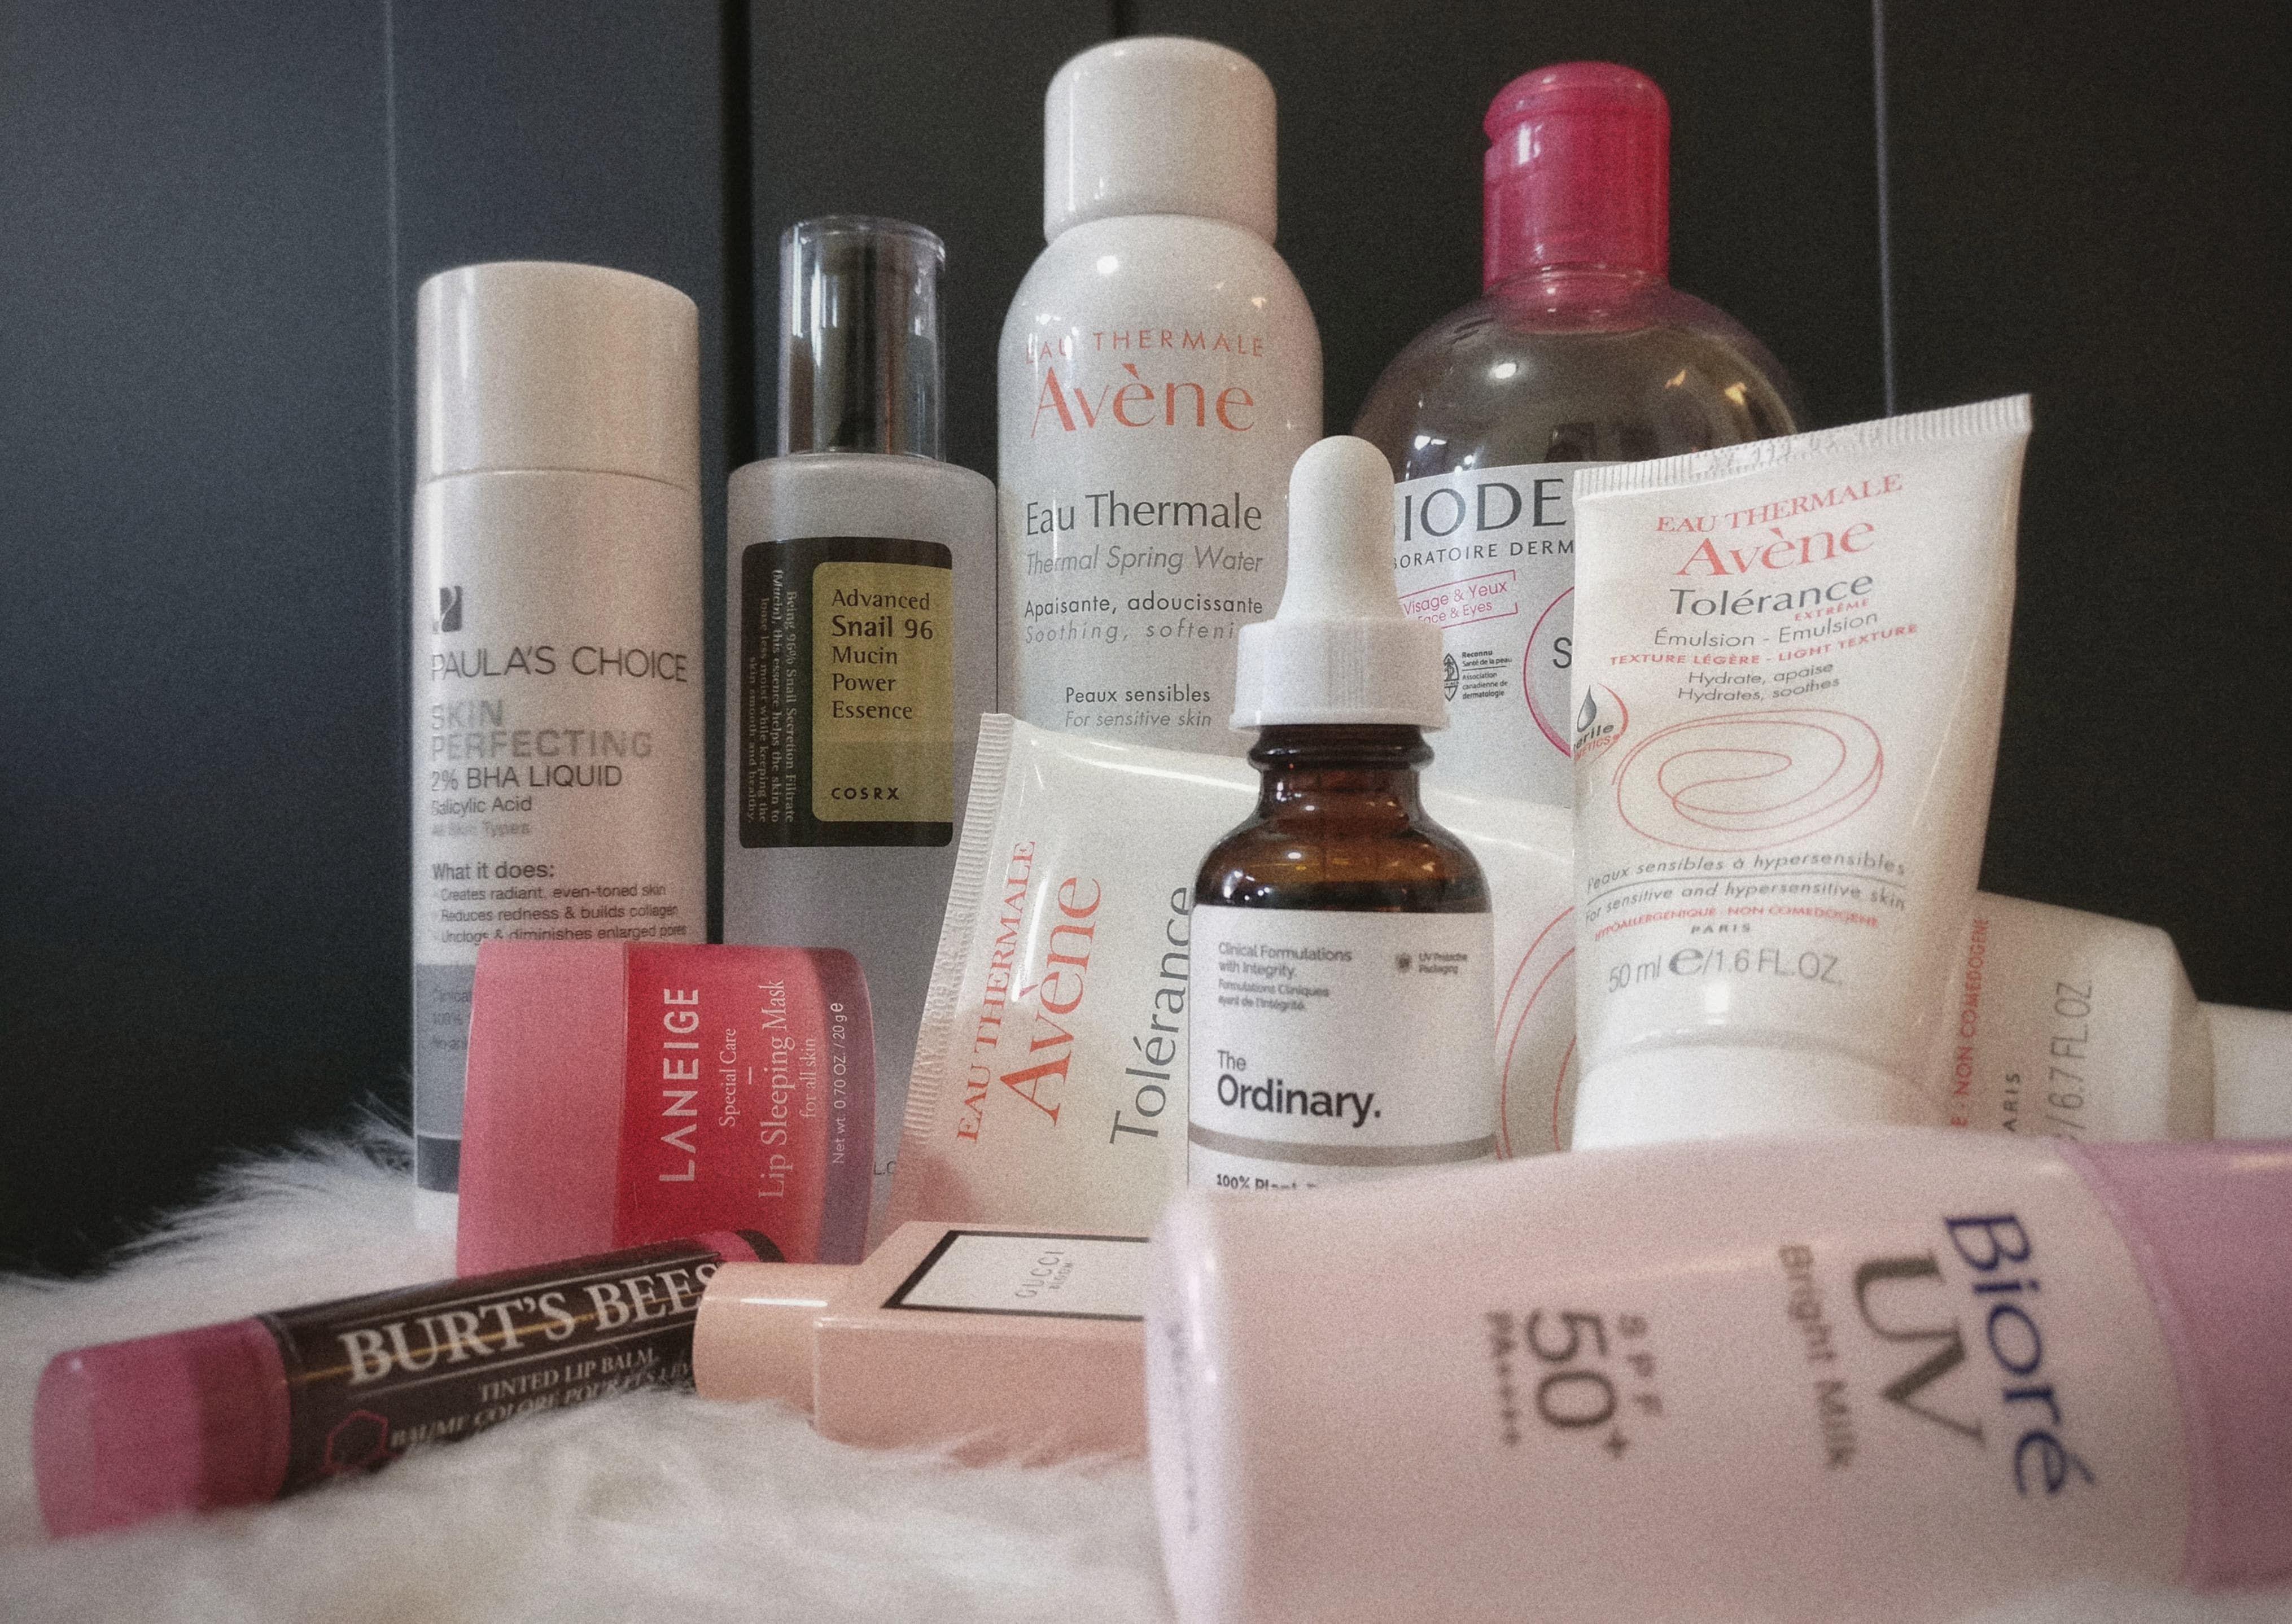 Shelfie Review Fungal Acne Safe Products Shelfie Acne Help